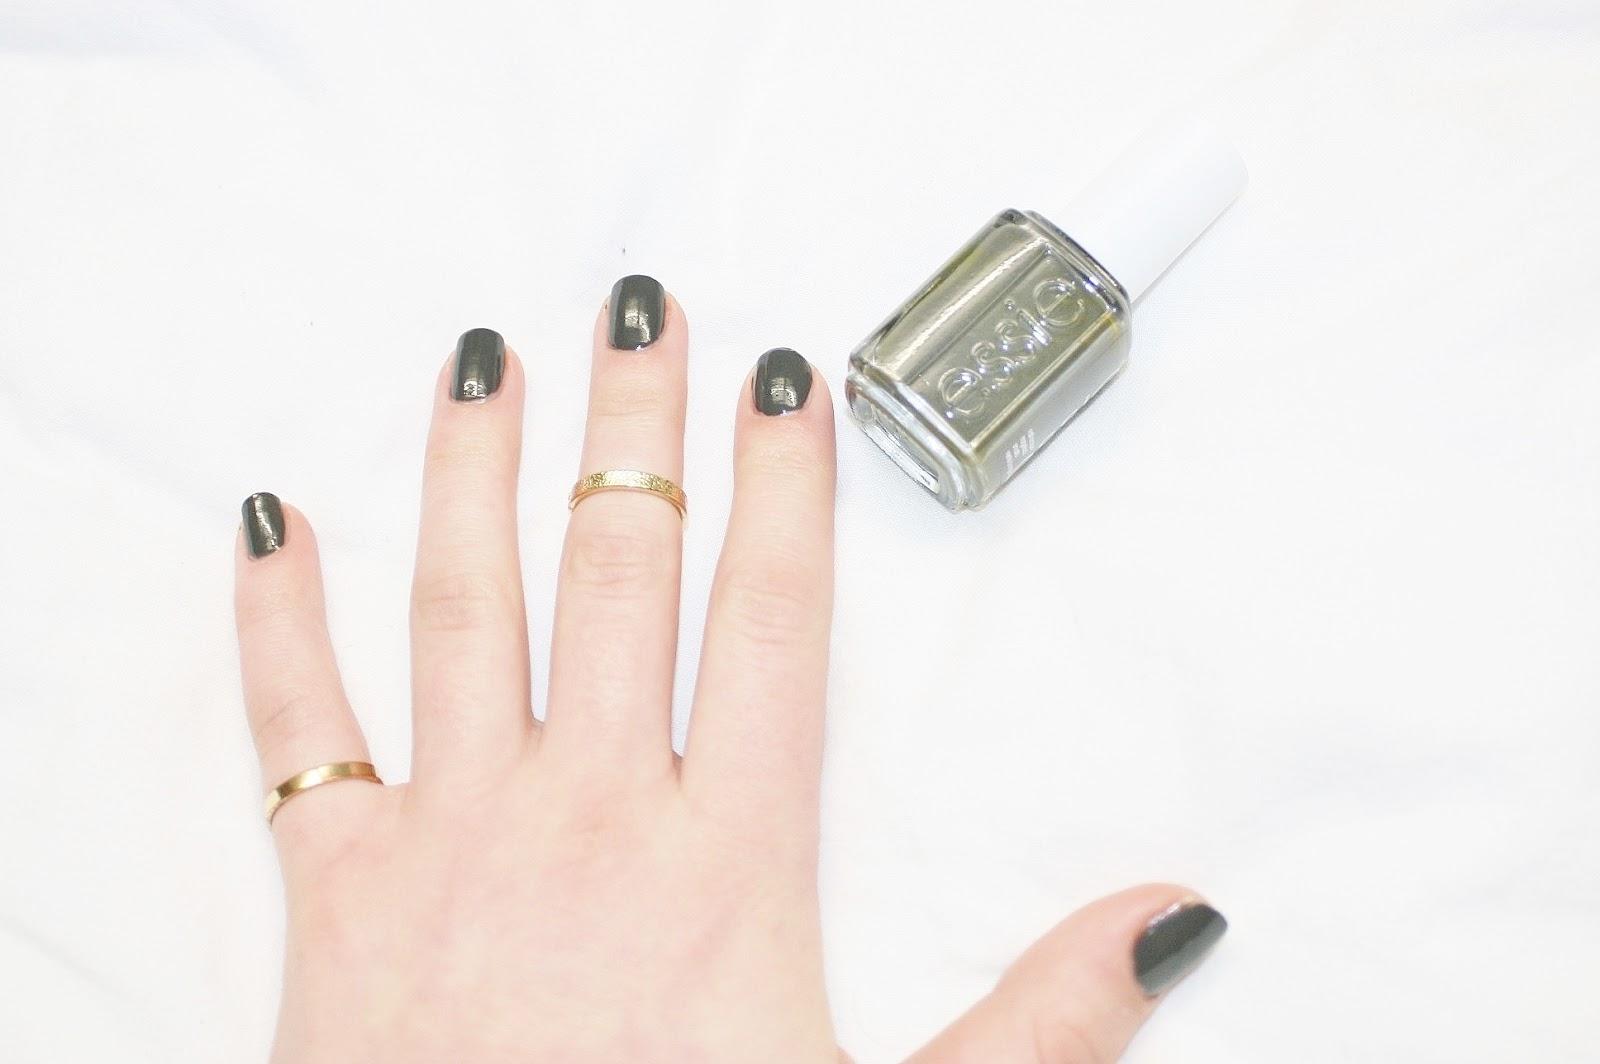 Katherine Penney Chic Style Beauty Manicure Nails Polish Essie Khaki Spring Pretty Gold Rings Urban Modern